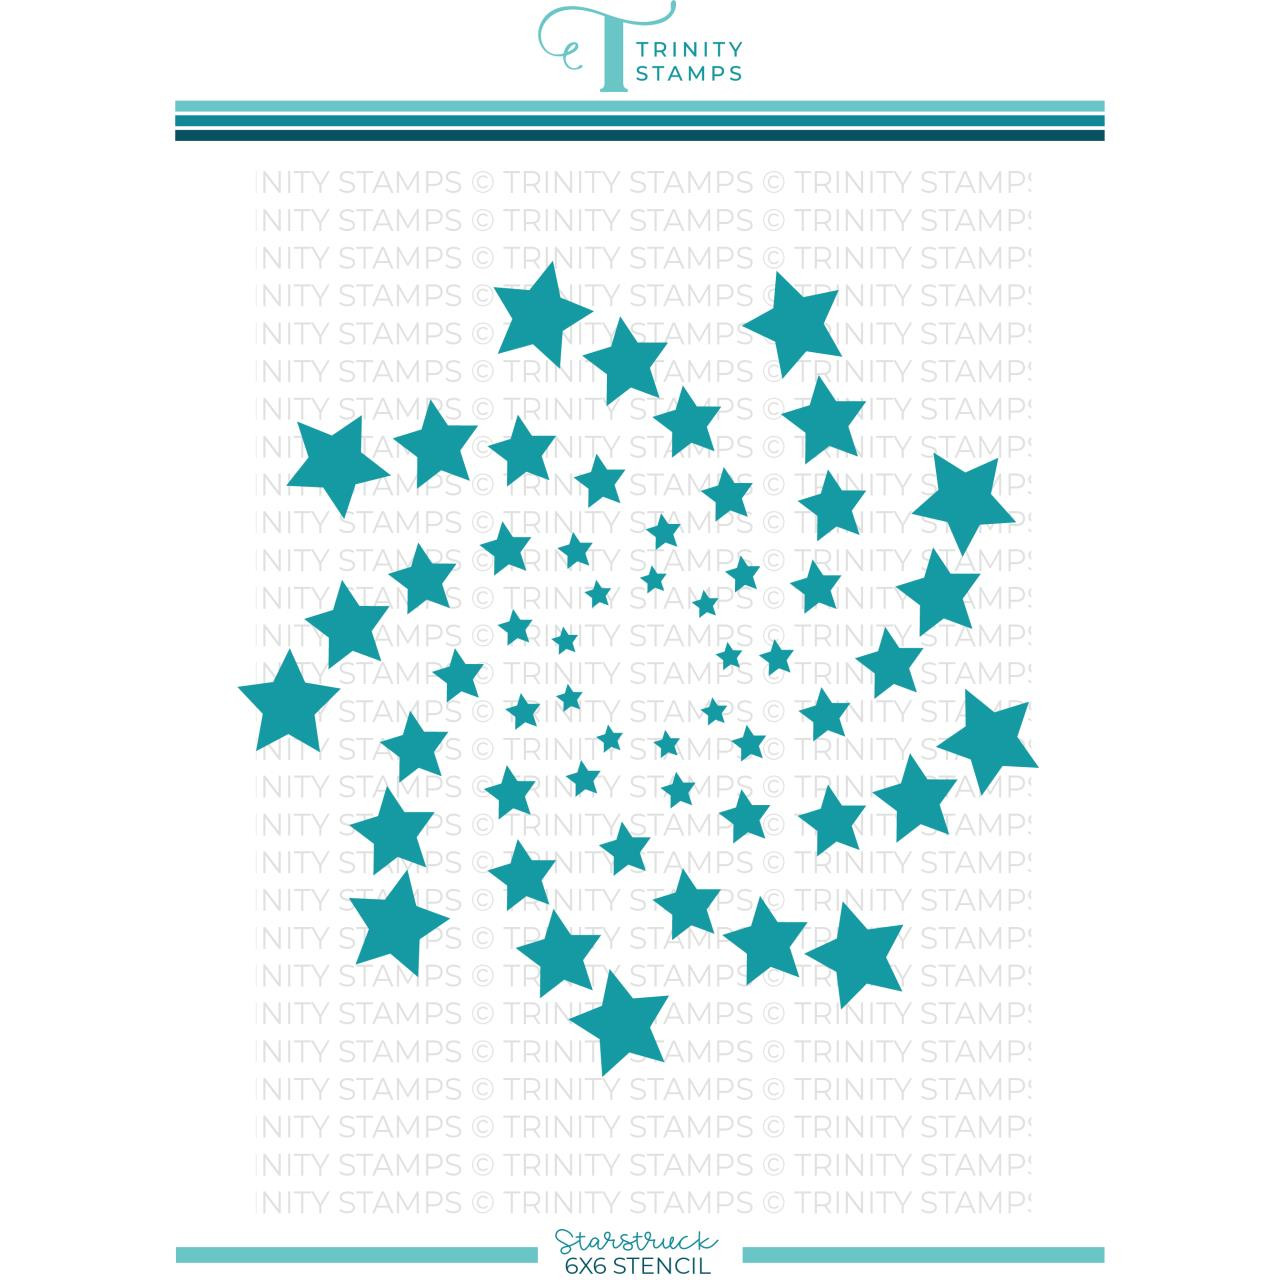 Starstruck, Trinity Stamps Stencil -